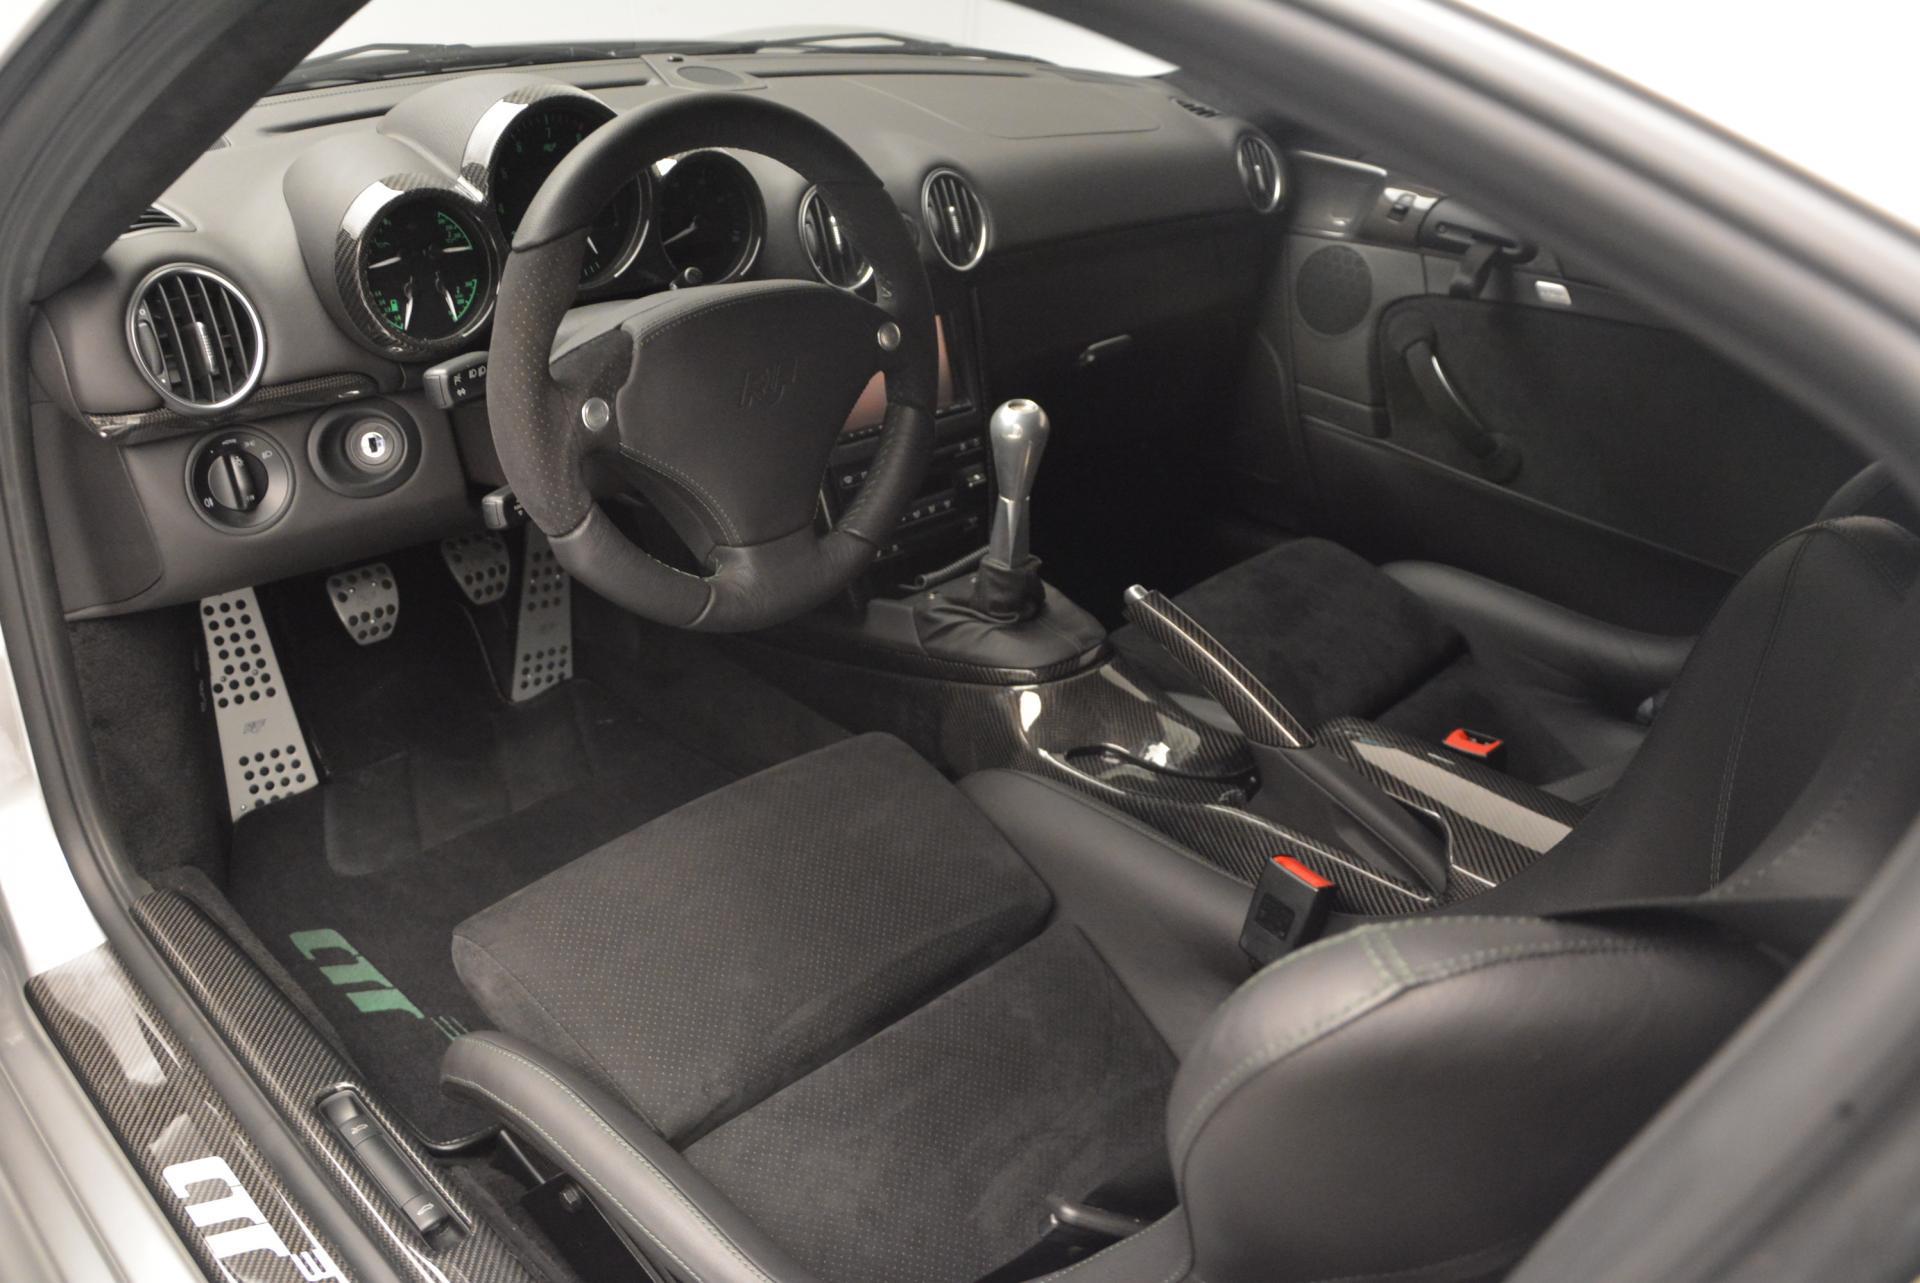 Used 2012 Porsche RUF CTR-3 Clubsport For Sale In Westport, CT 110_p15